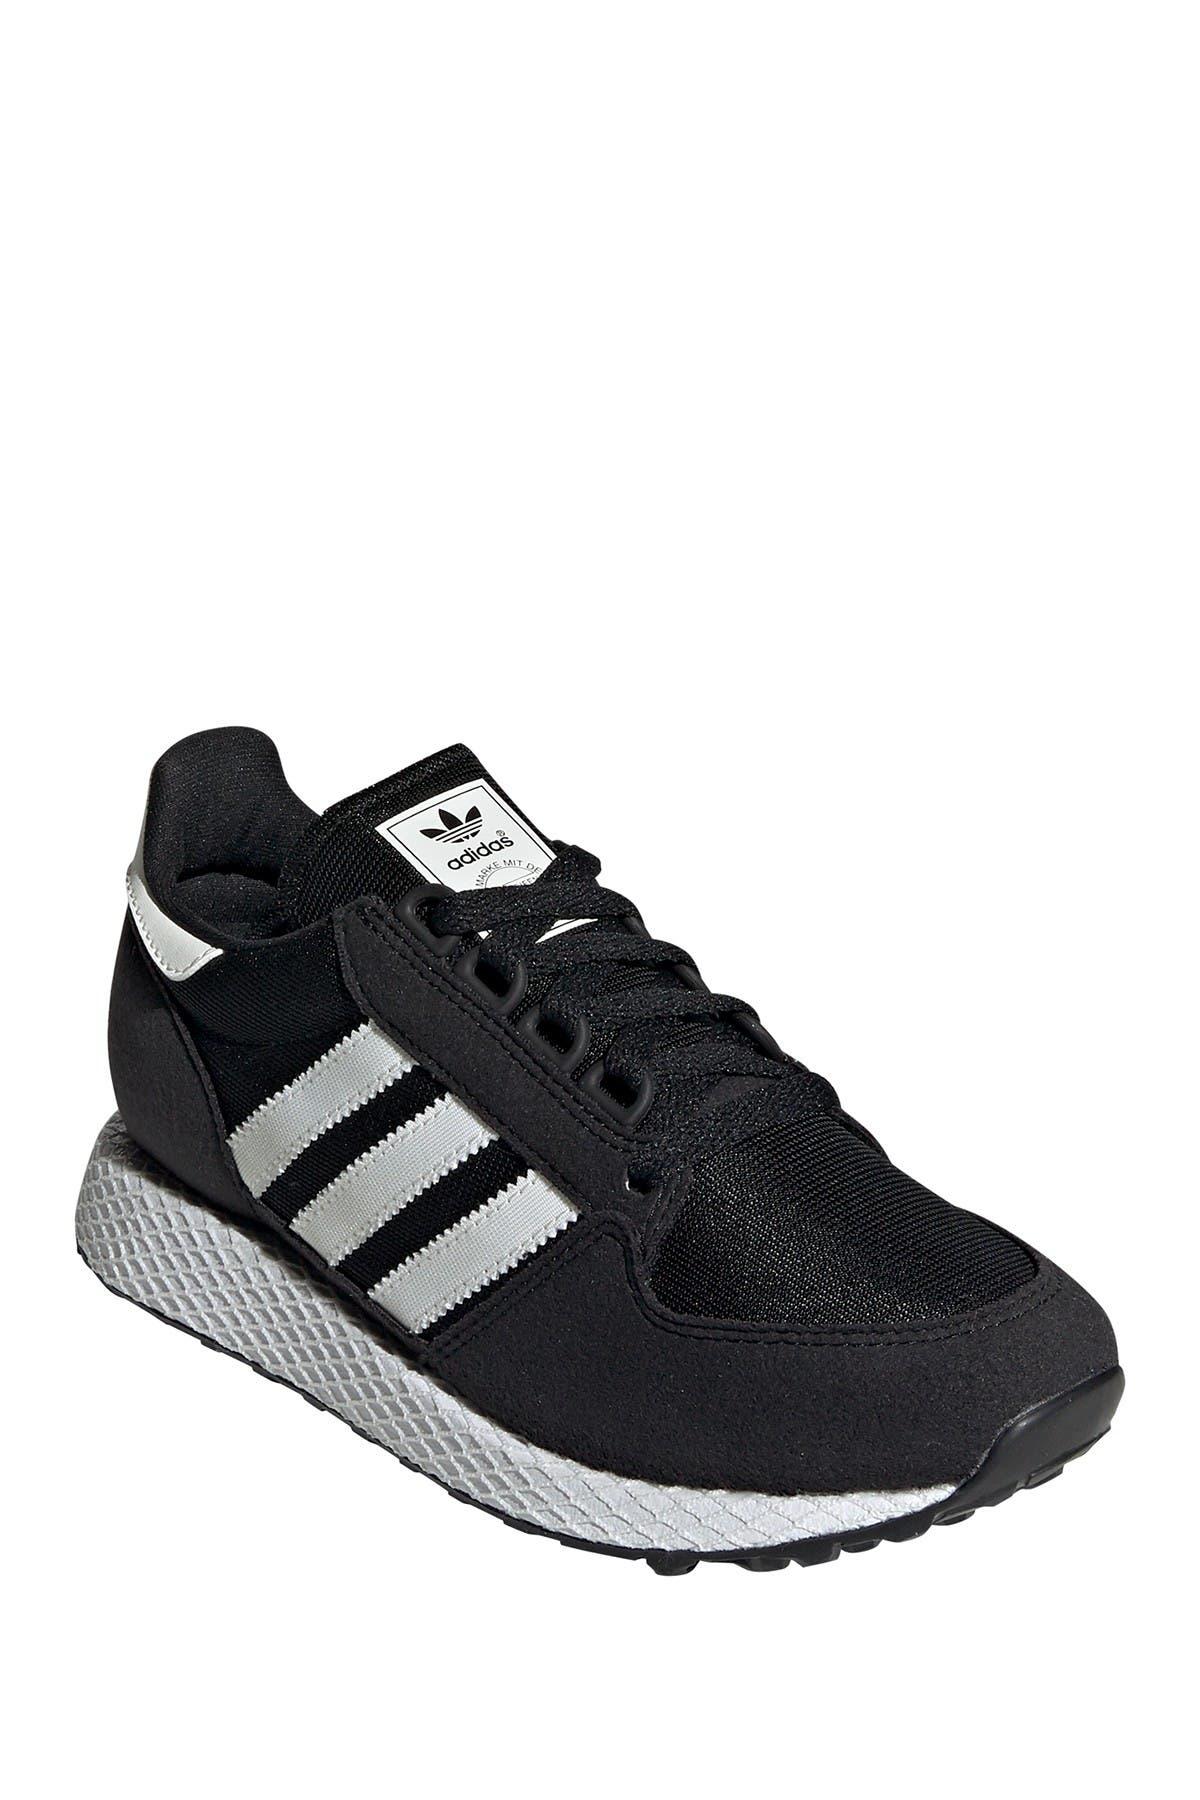 Image of ADIDAS ORIGINALS Forest Grove Sneaker